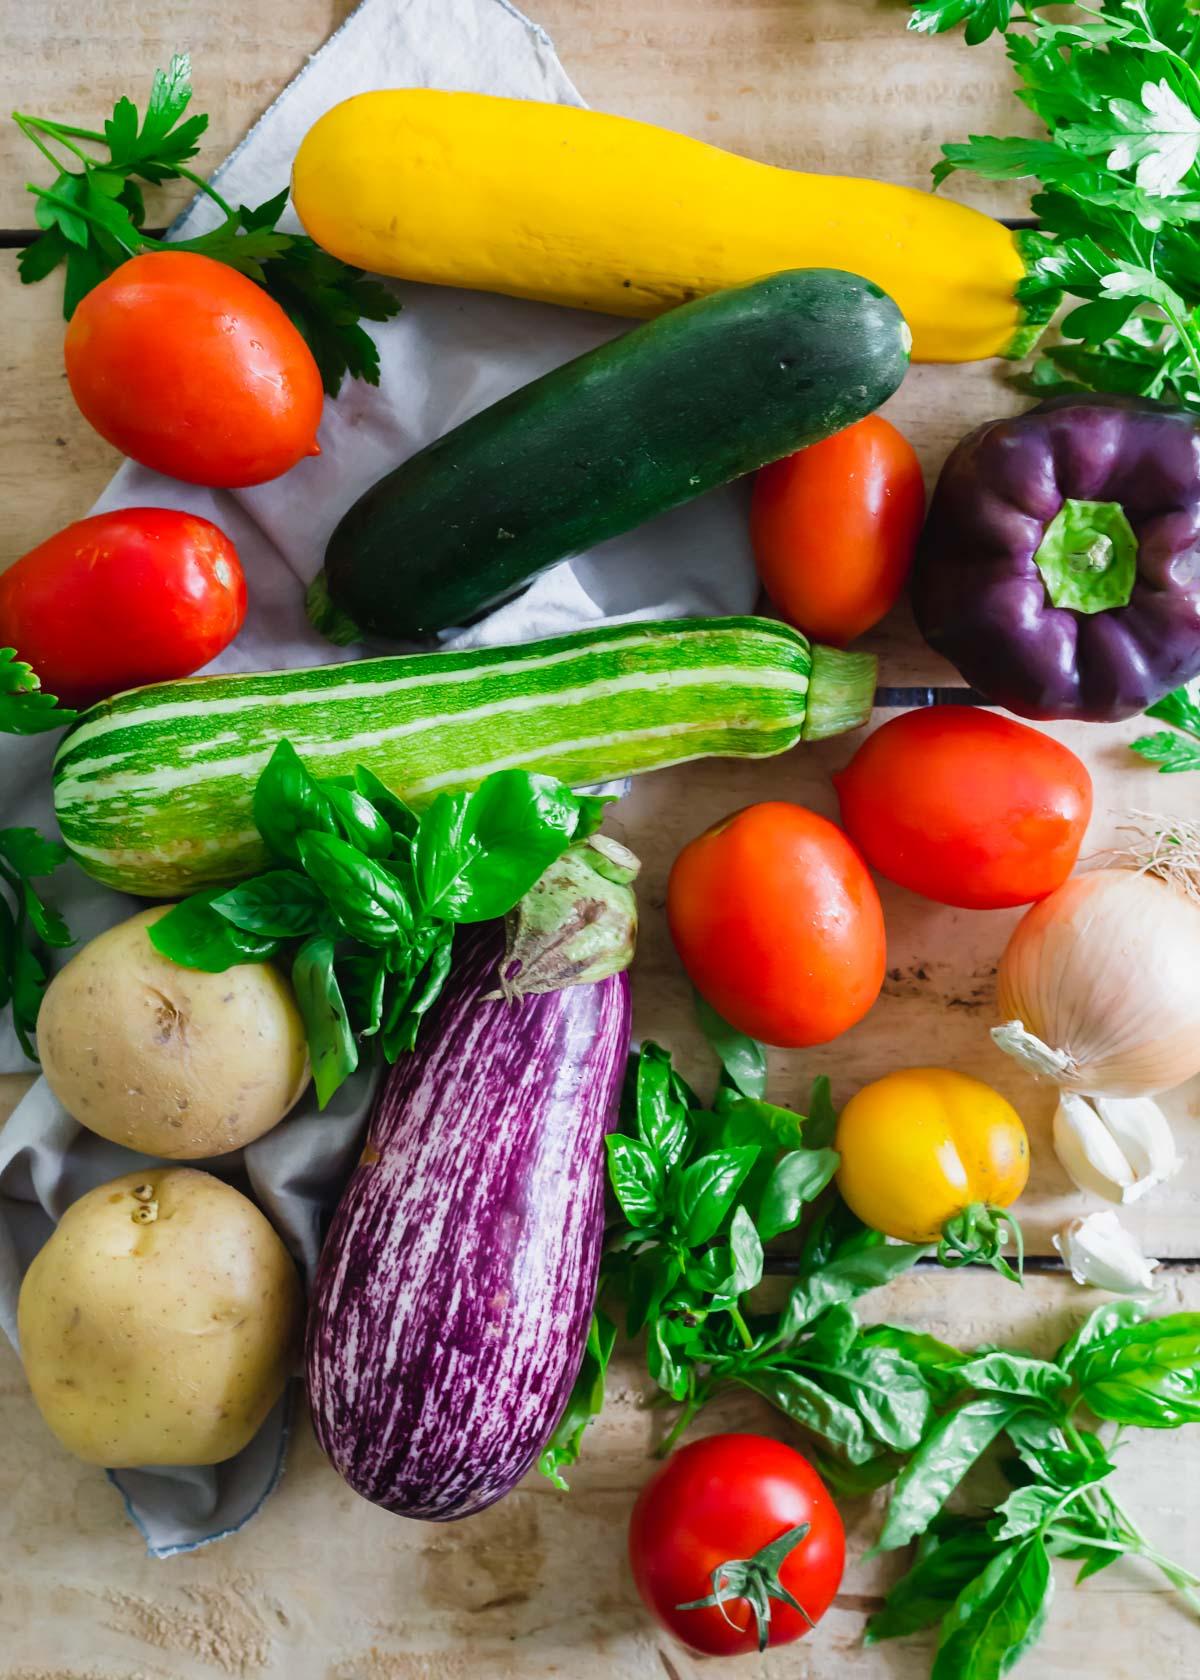 Summer vegetables to make Italian ciambotta (giambotta).